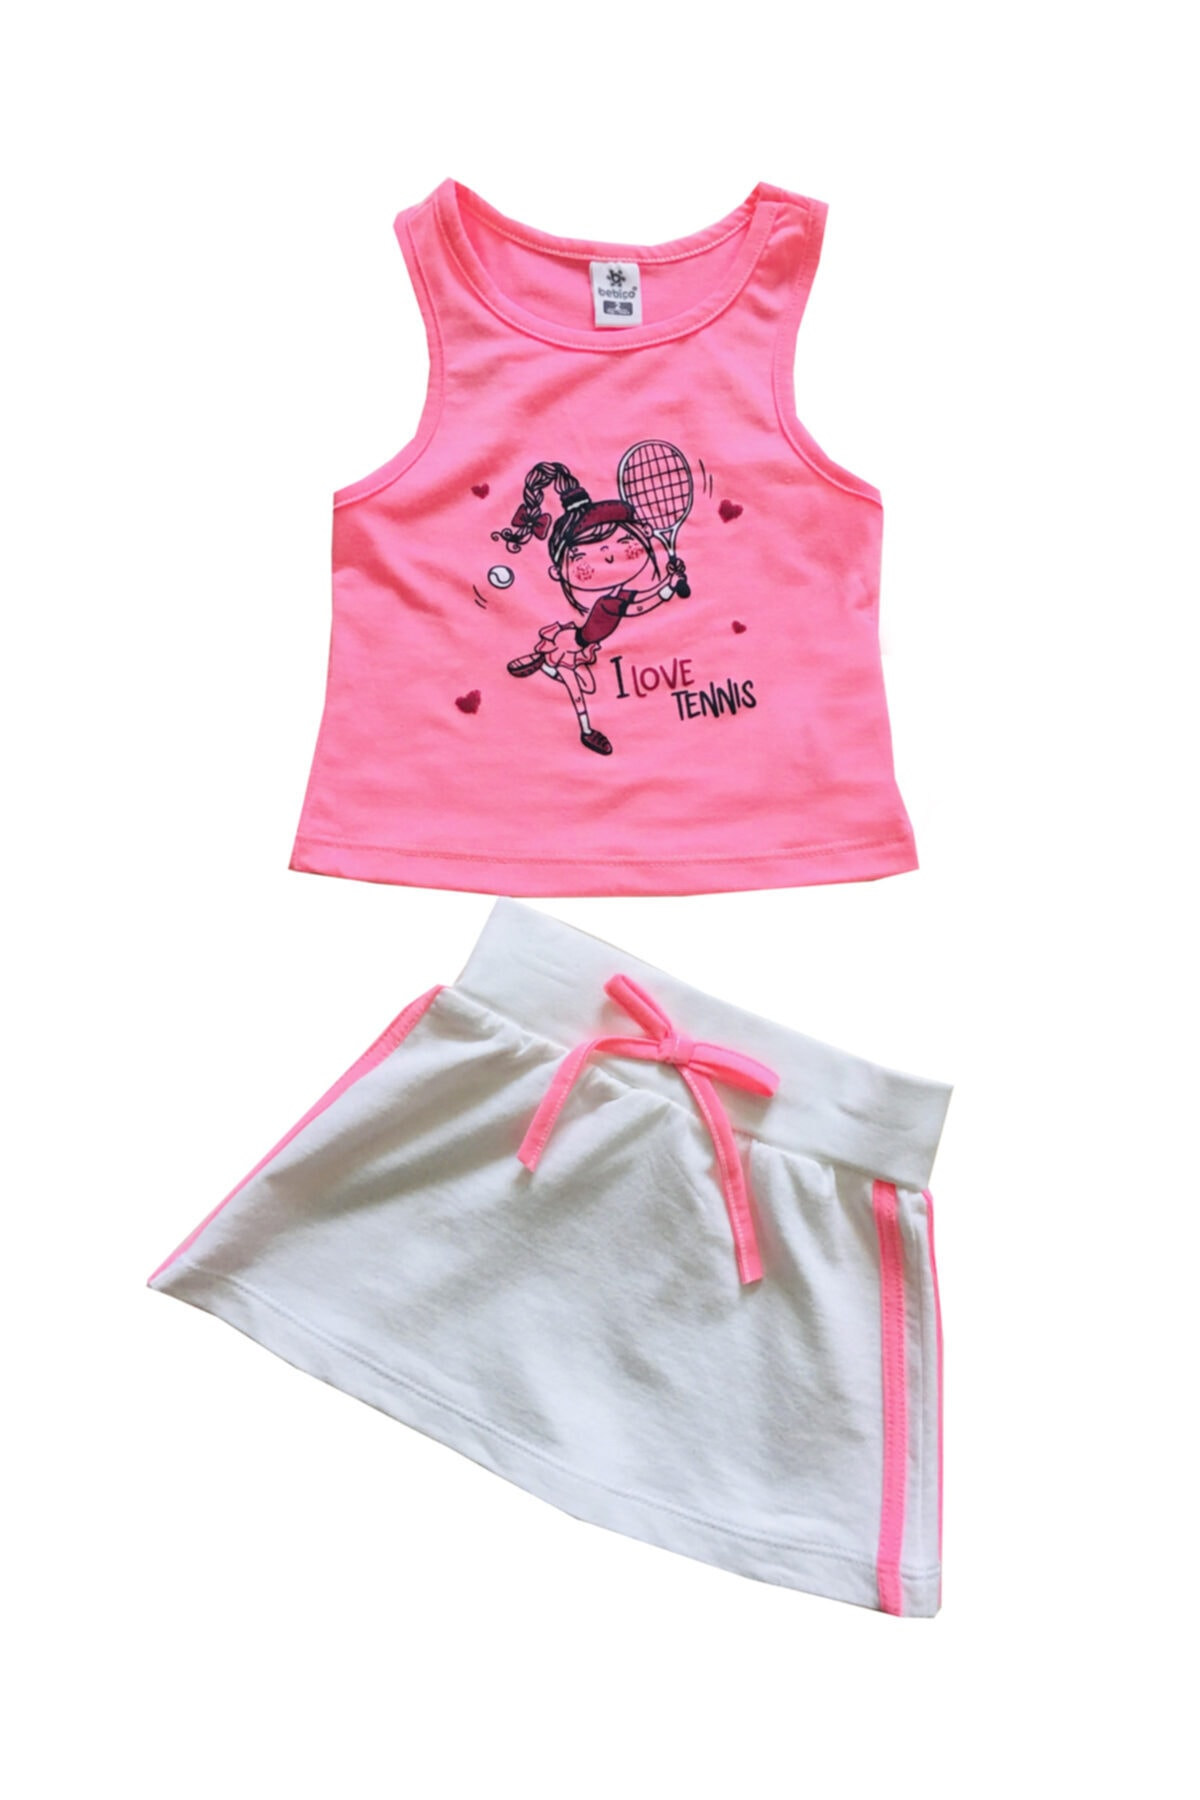 BEBİÇO KİDS Kız Çocuk Pembe Love Tennis Takım 1